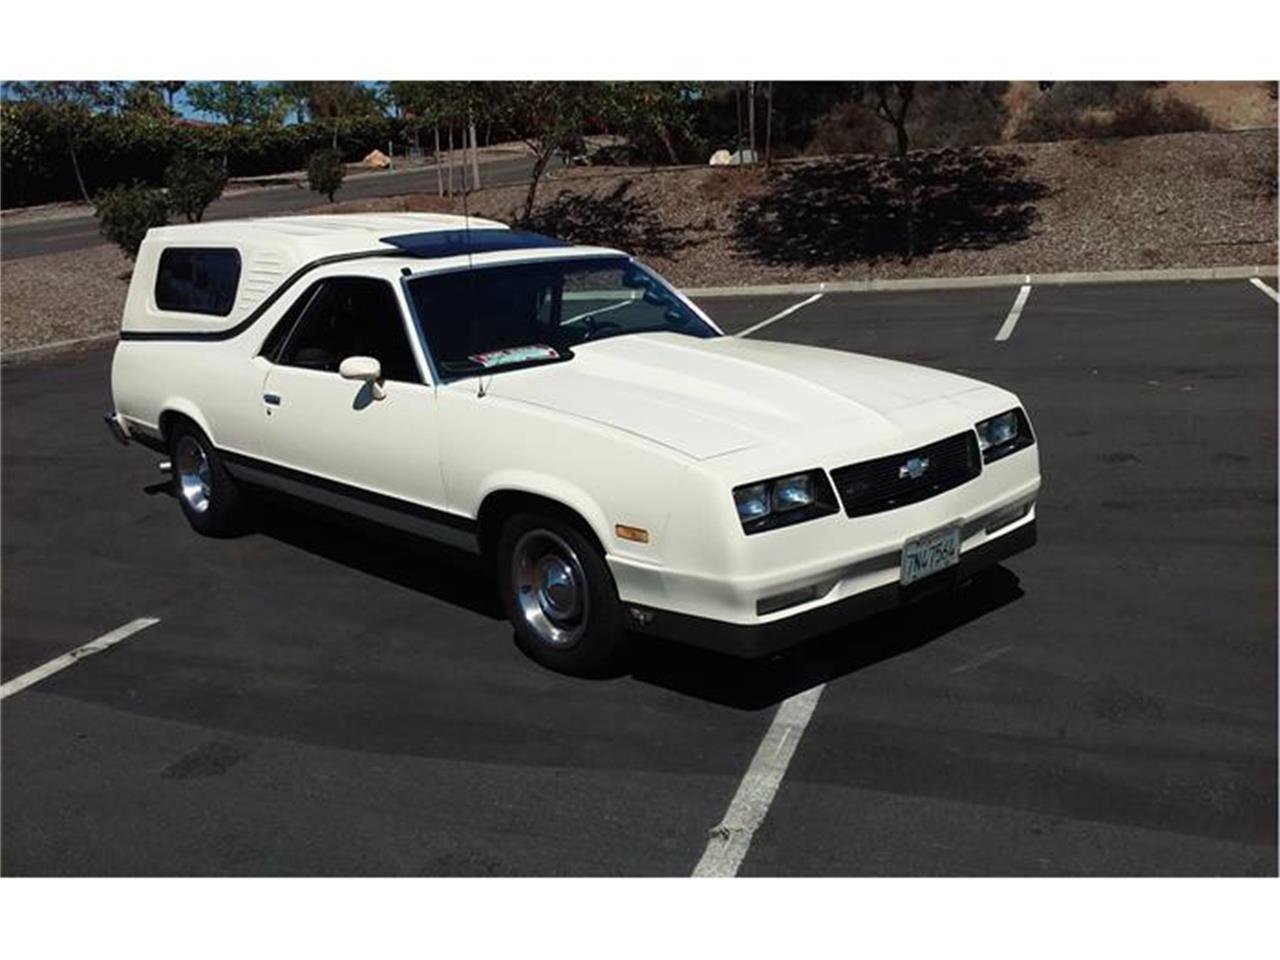 Large Picture of 1983 Chevrolet El Camino - $8,700.00 - J05V